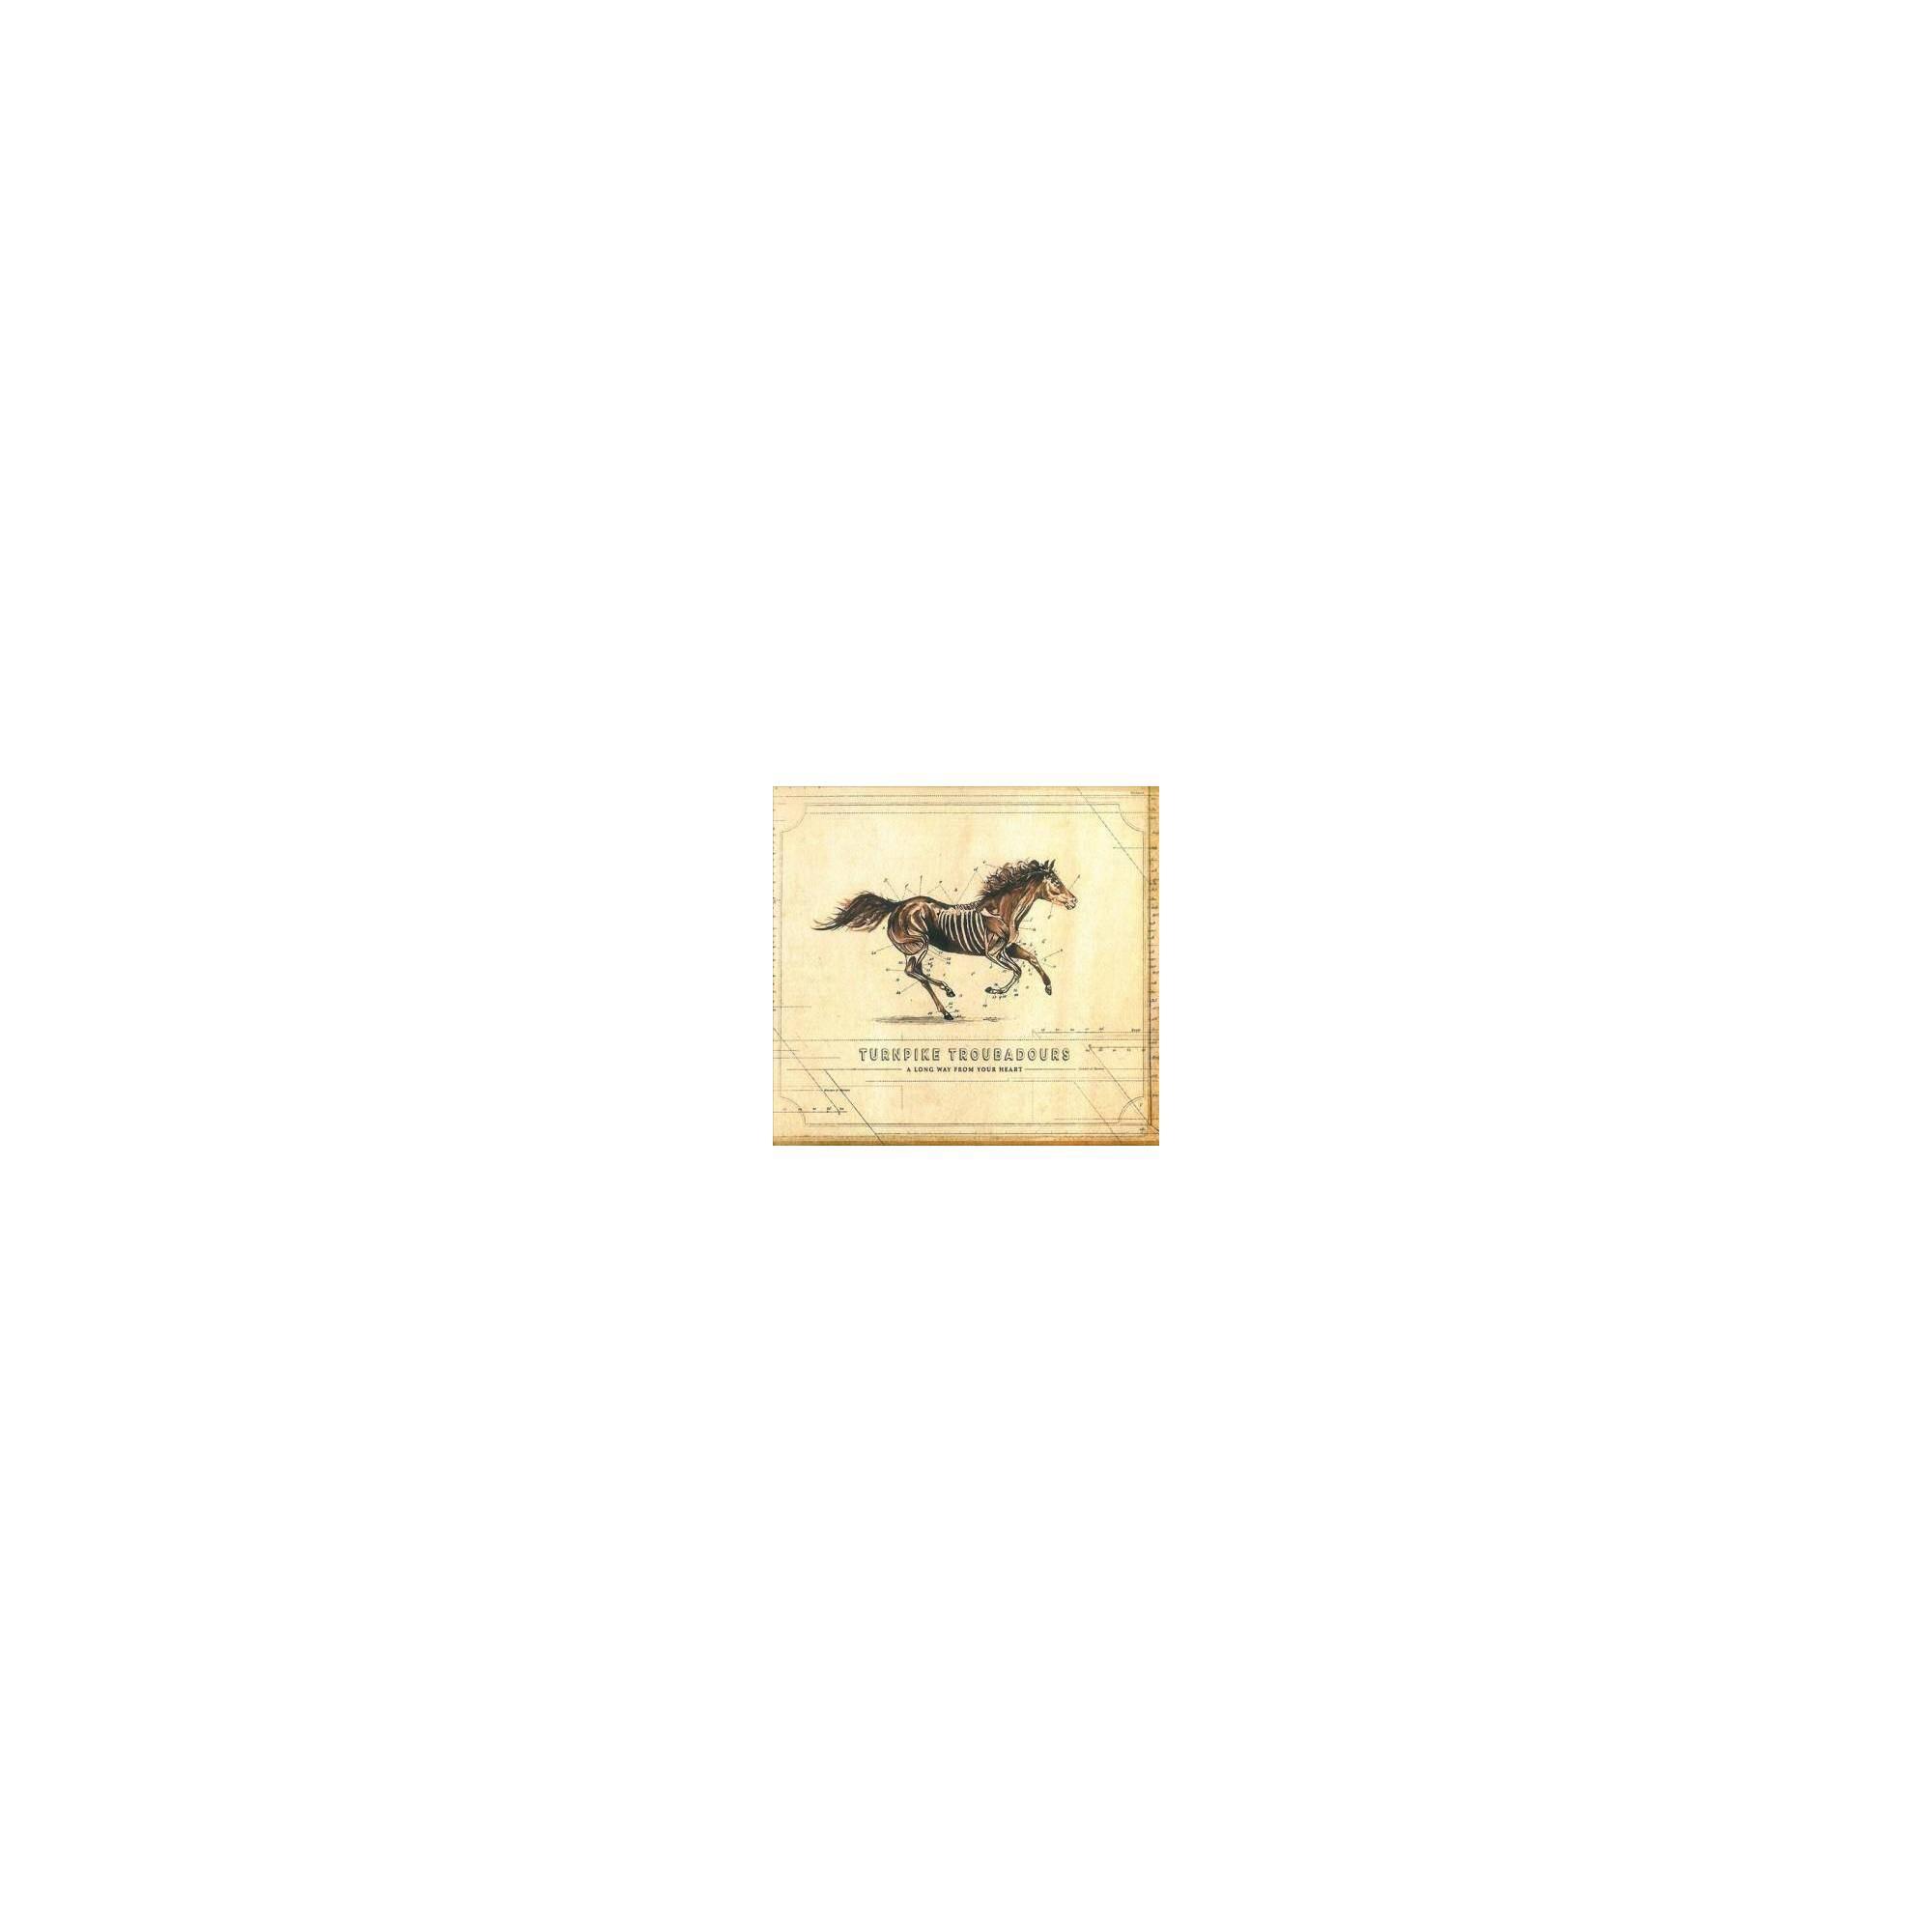 Turnpike Troubadours - A Long Way From Your Heart (CD)